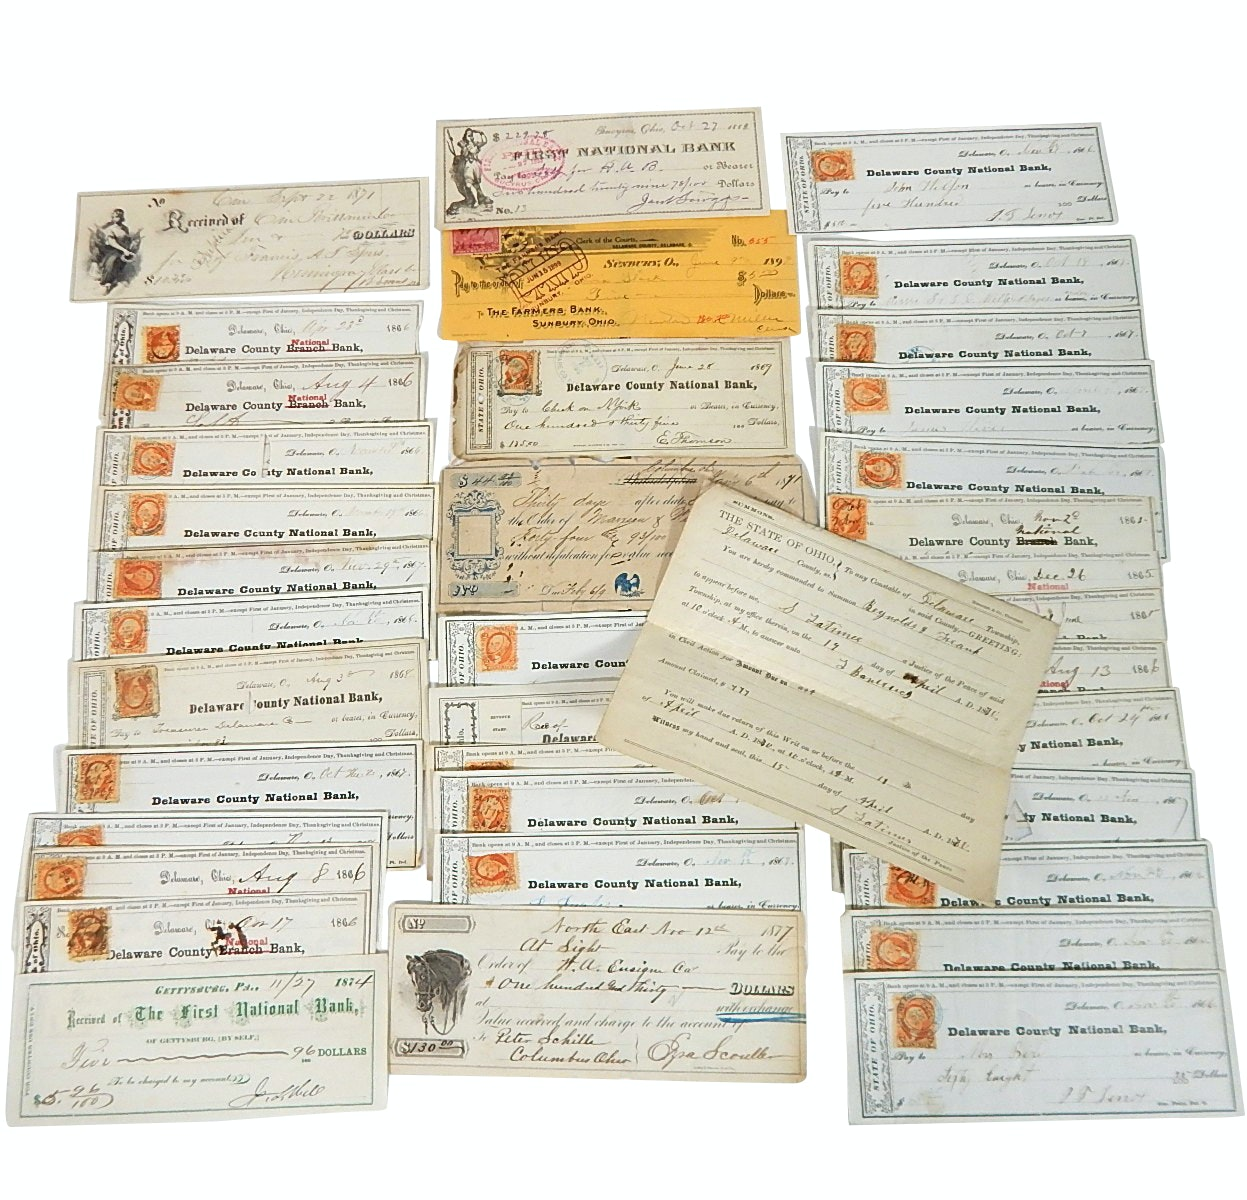 Late 1800s Post-Civil War Cancelled Checks